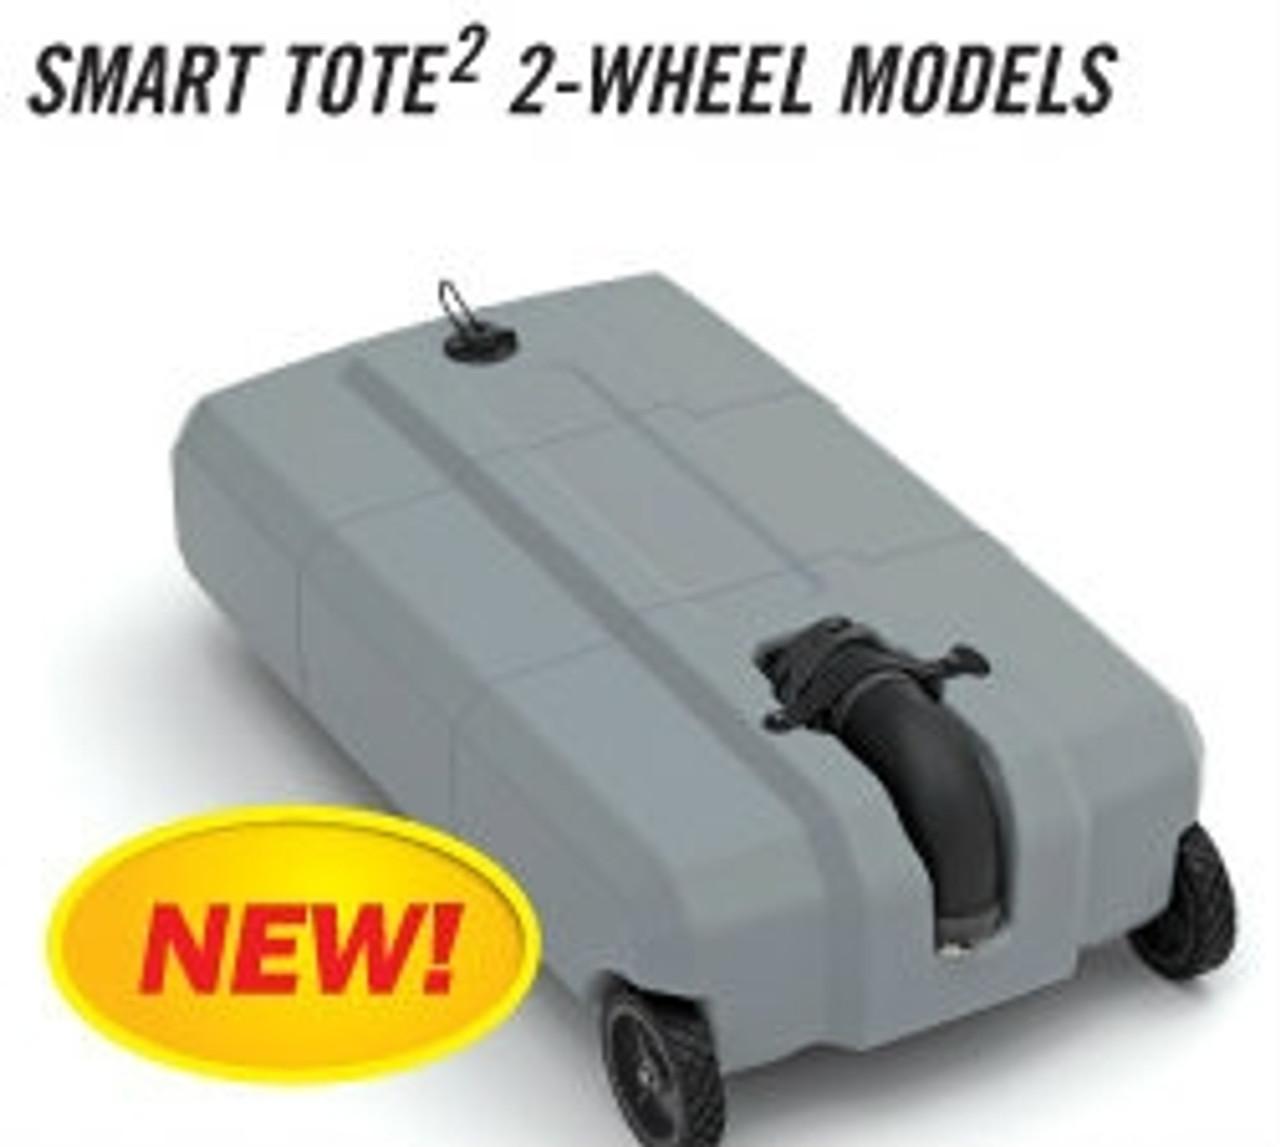 Smart-Tote 2 Two Wheel Tote Tanks